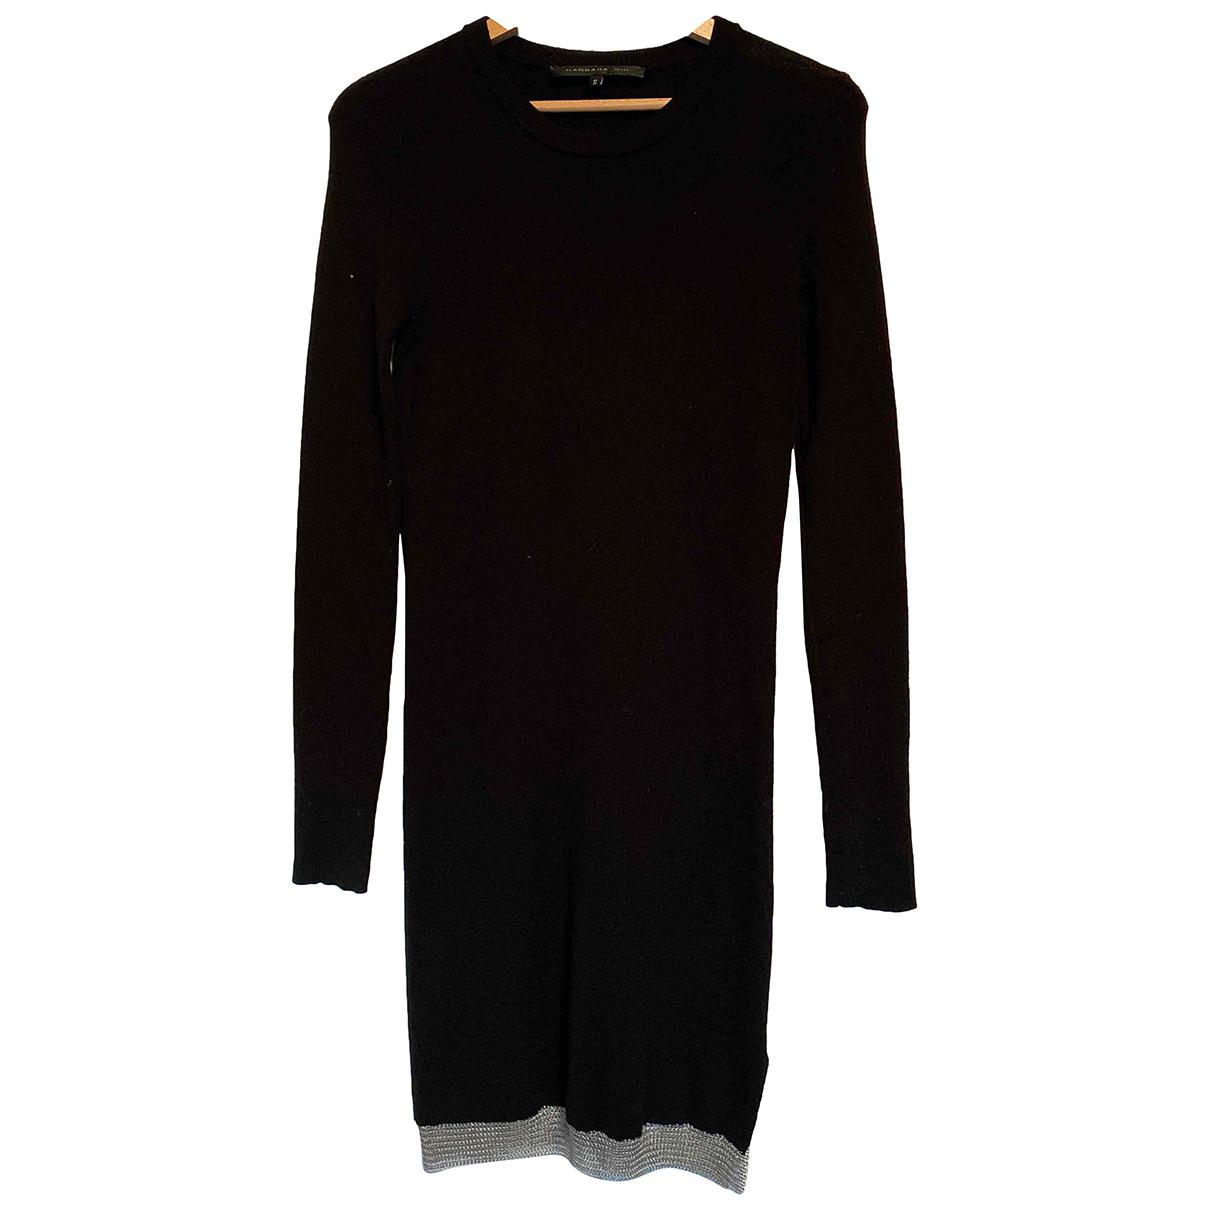 Barbara Bui N Black Wool dress for Women S International